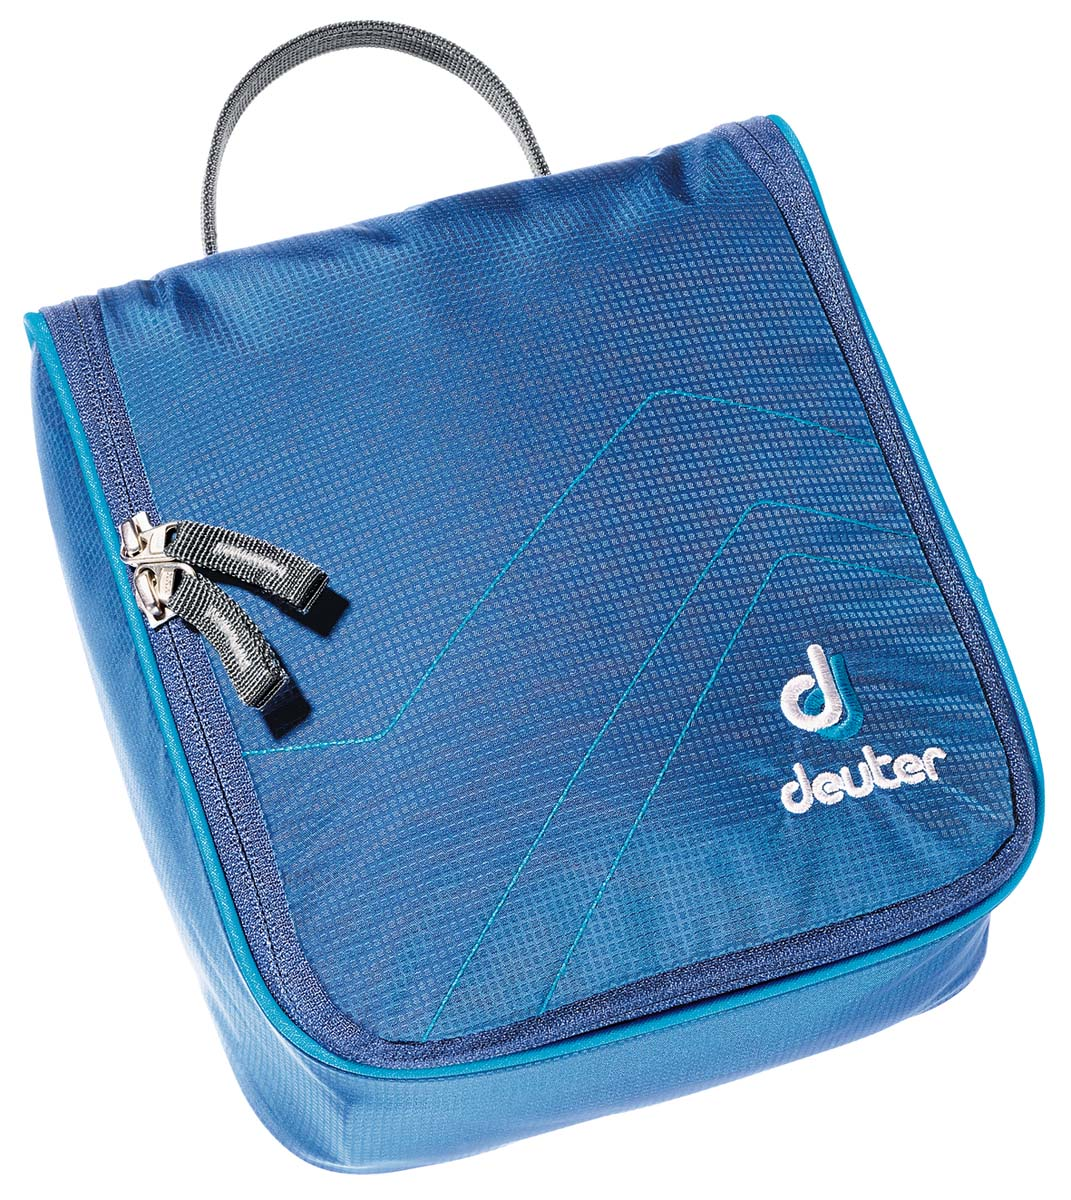 Косметичка Deuter Accessories Wash Center I, цвет: светло-голубой, бирюзовый, 22 см х 19 см х 8 см